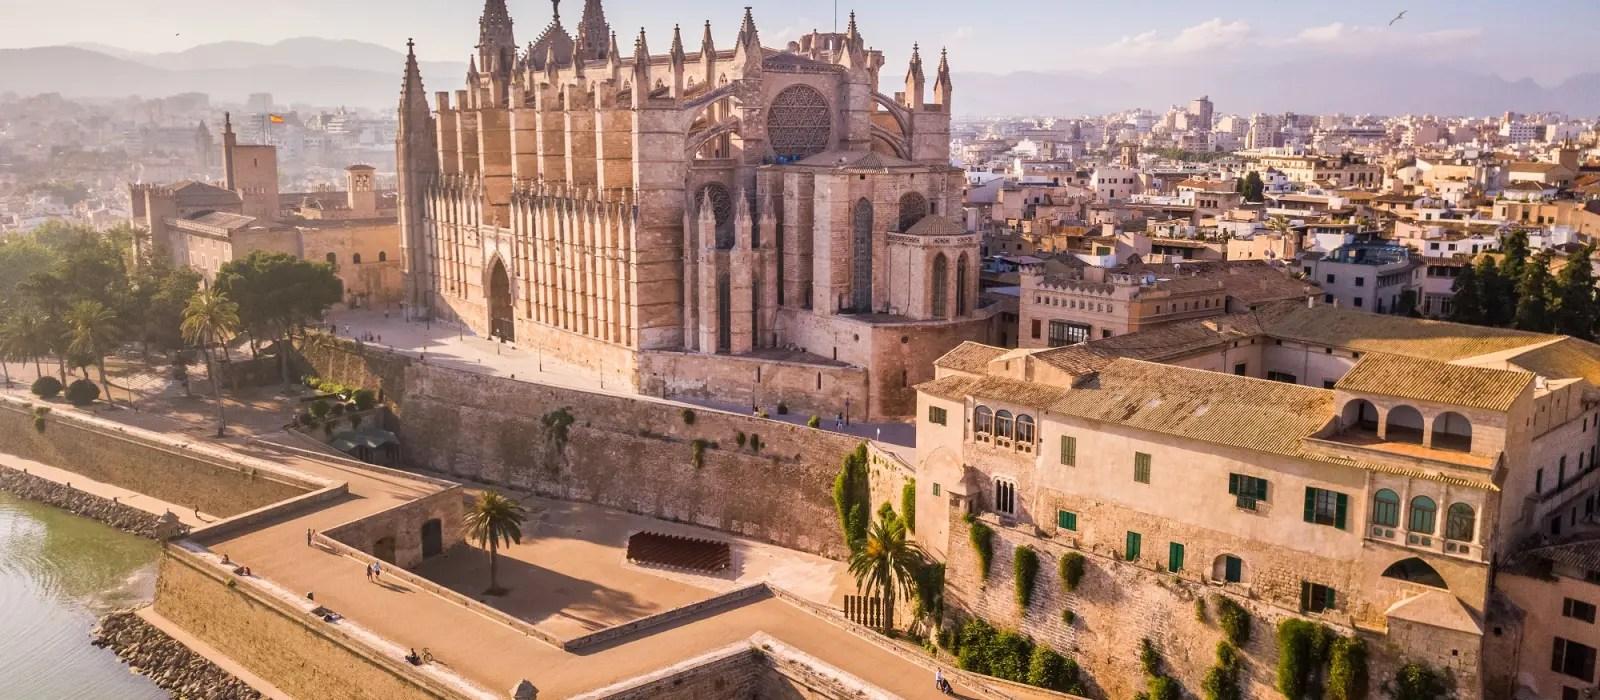 reiseziel palma de mallorca in spanien